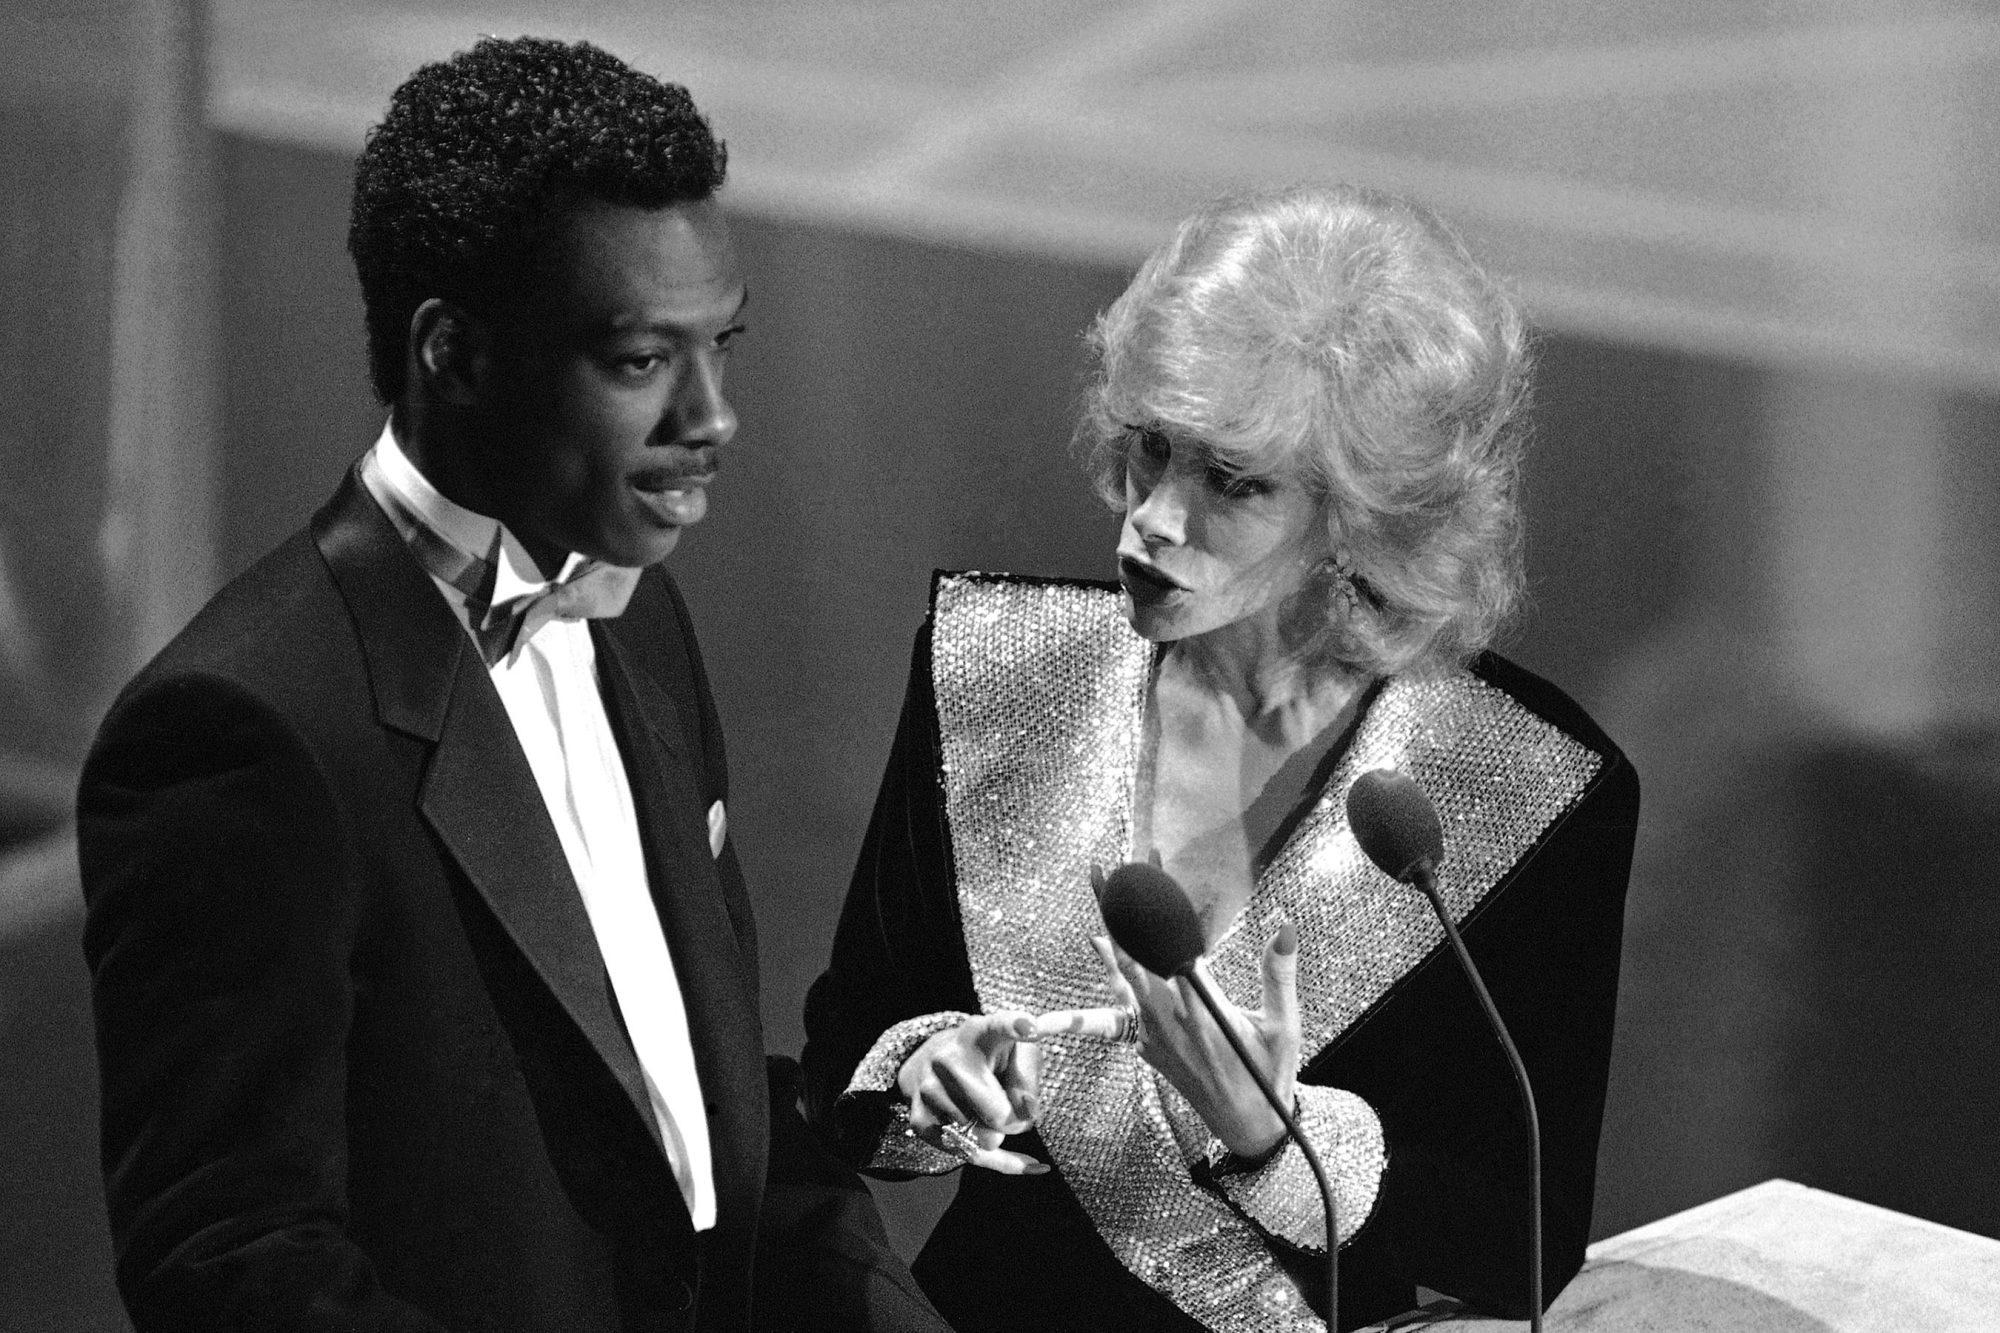 Joan Rivers and Eddie Murphy Emmy Award 1983, Pasadena, USA